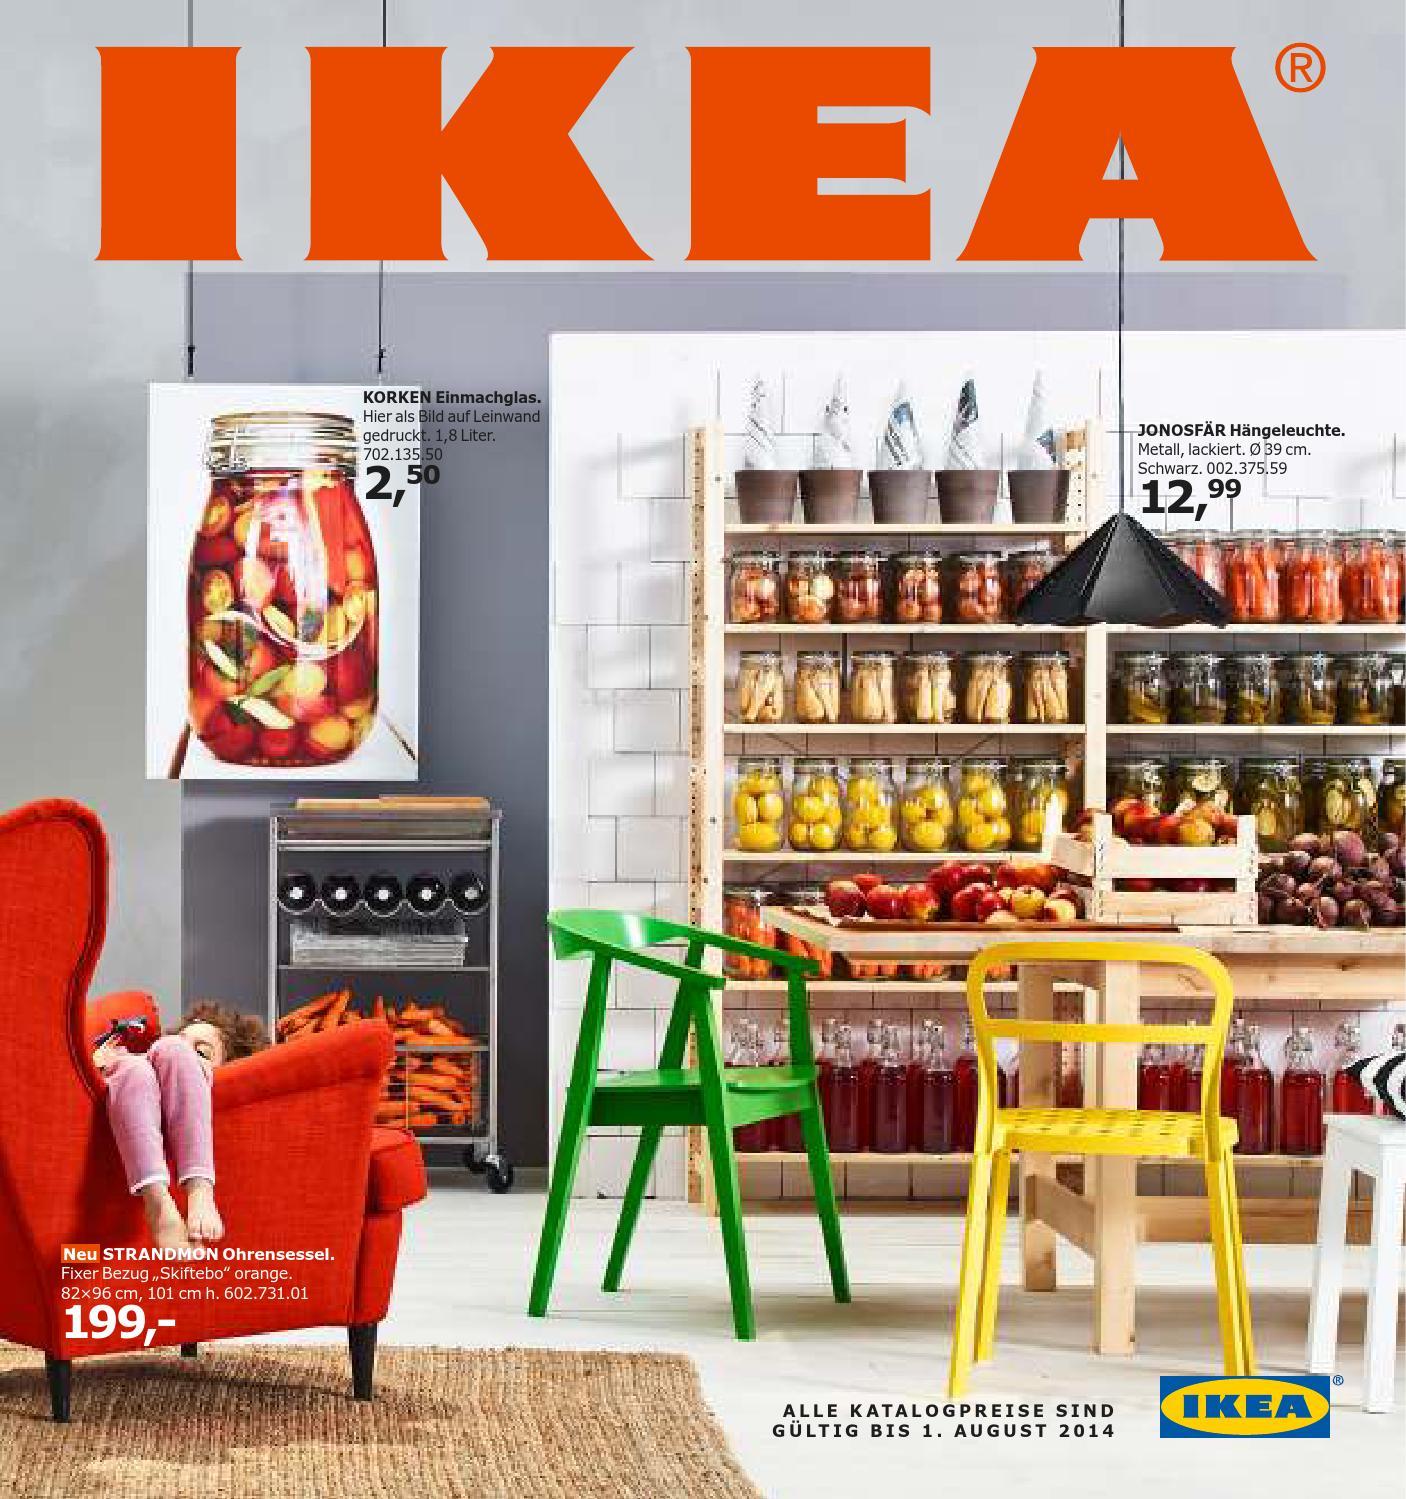 IKEA Katalog 2014 - Österreich by PromoAngebote.at - issuu